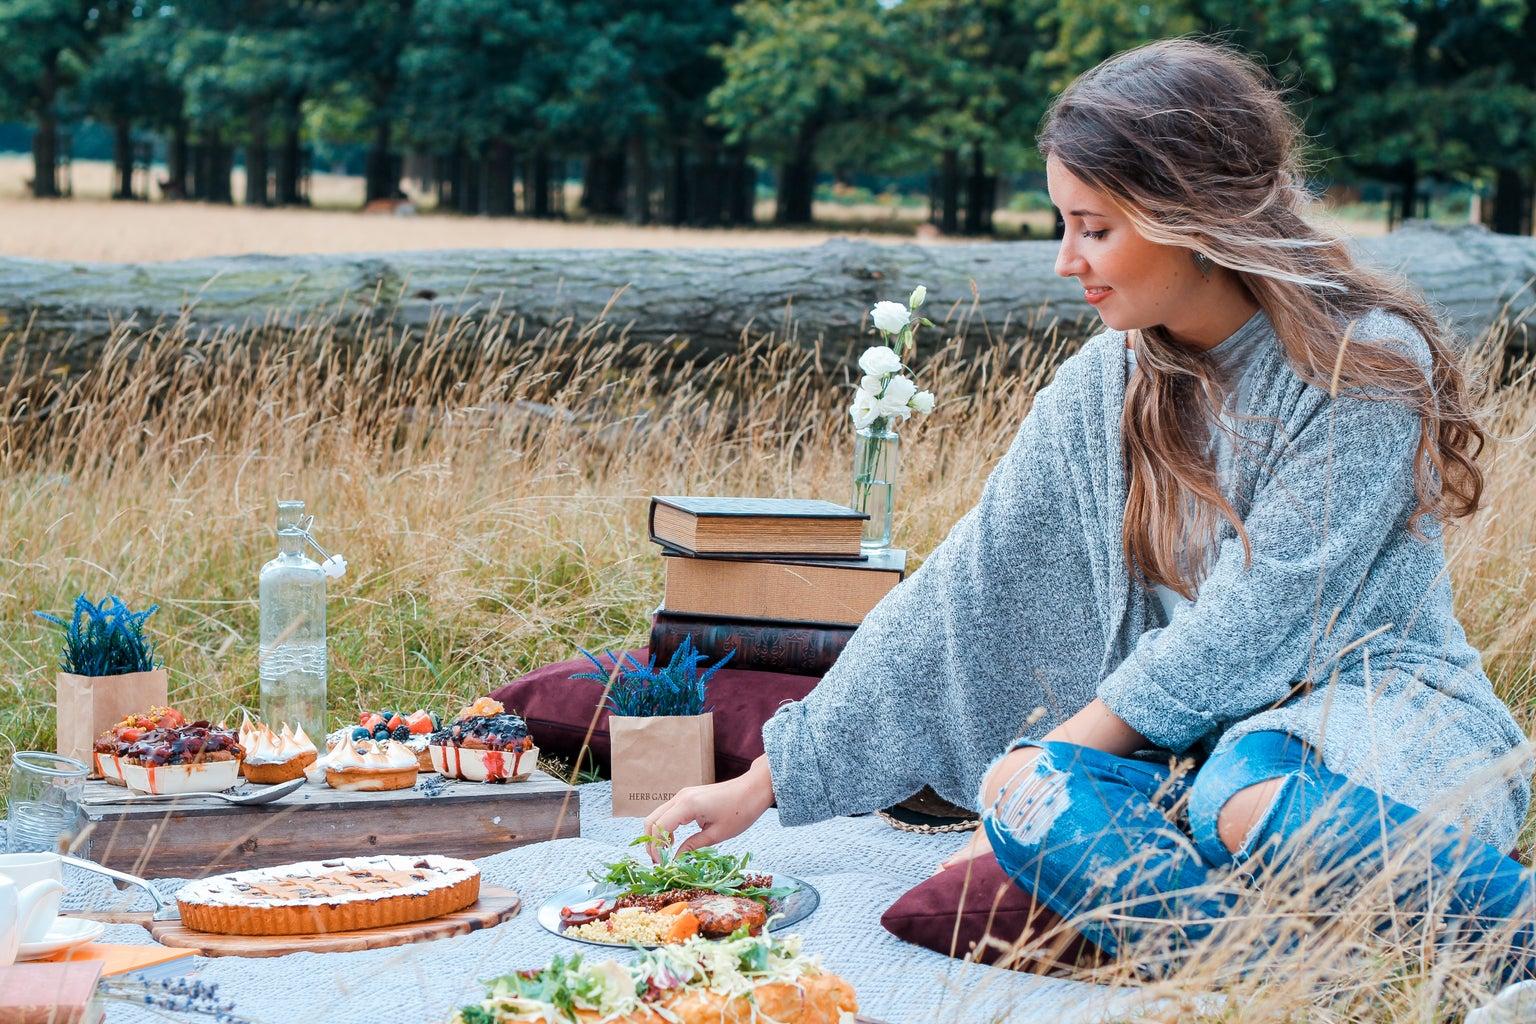 woman sitting on blanket having a picnic